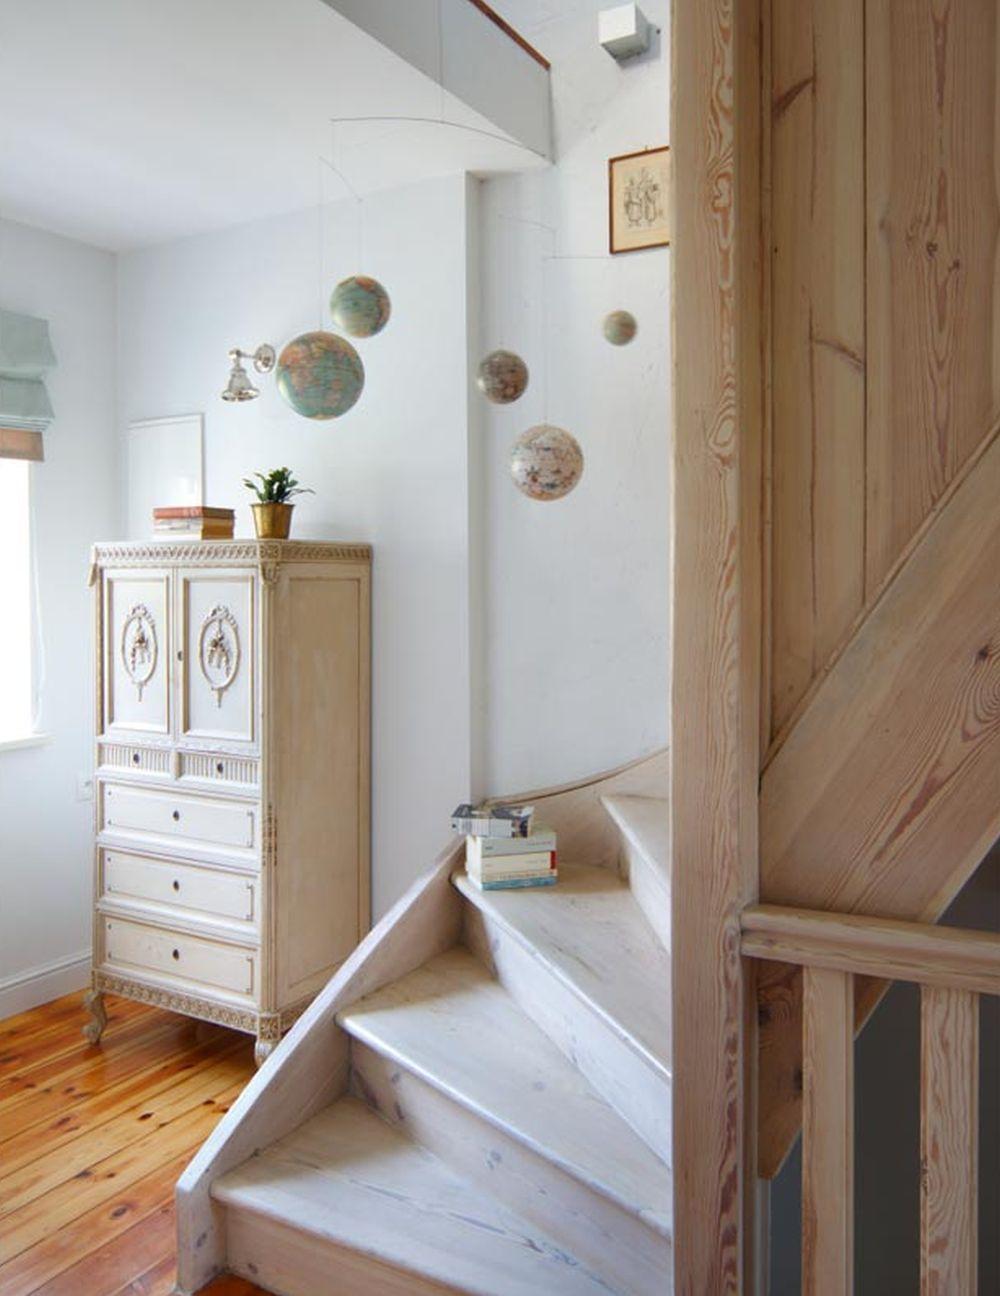 adelaparvu.com despre casa cu interior in stil englezesc, casa Polonia, design Marta Sikorska, Foto Michal Zalewski (6)